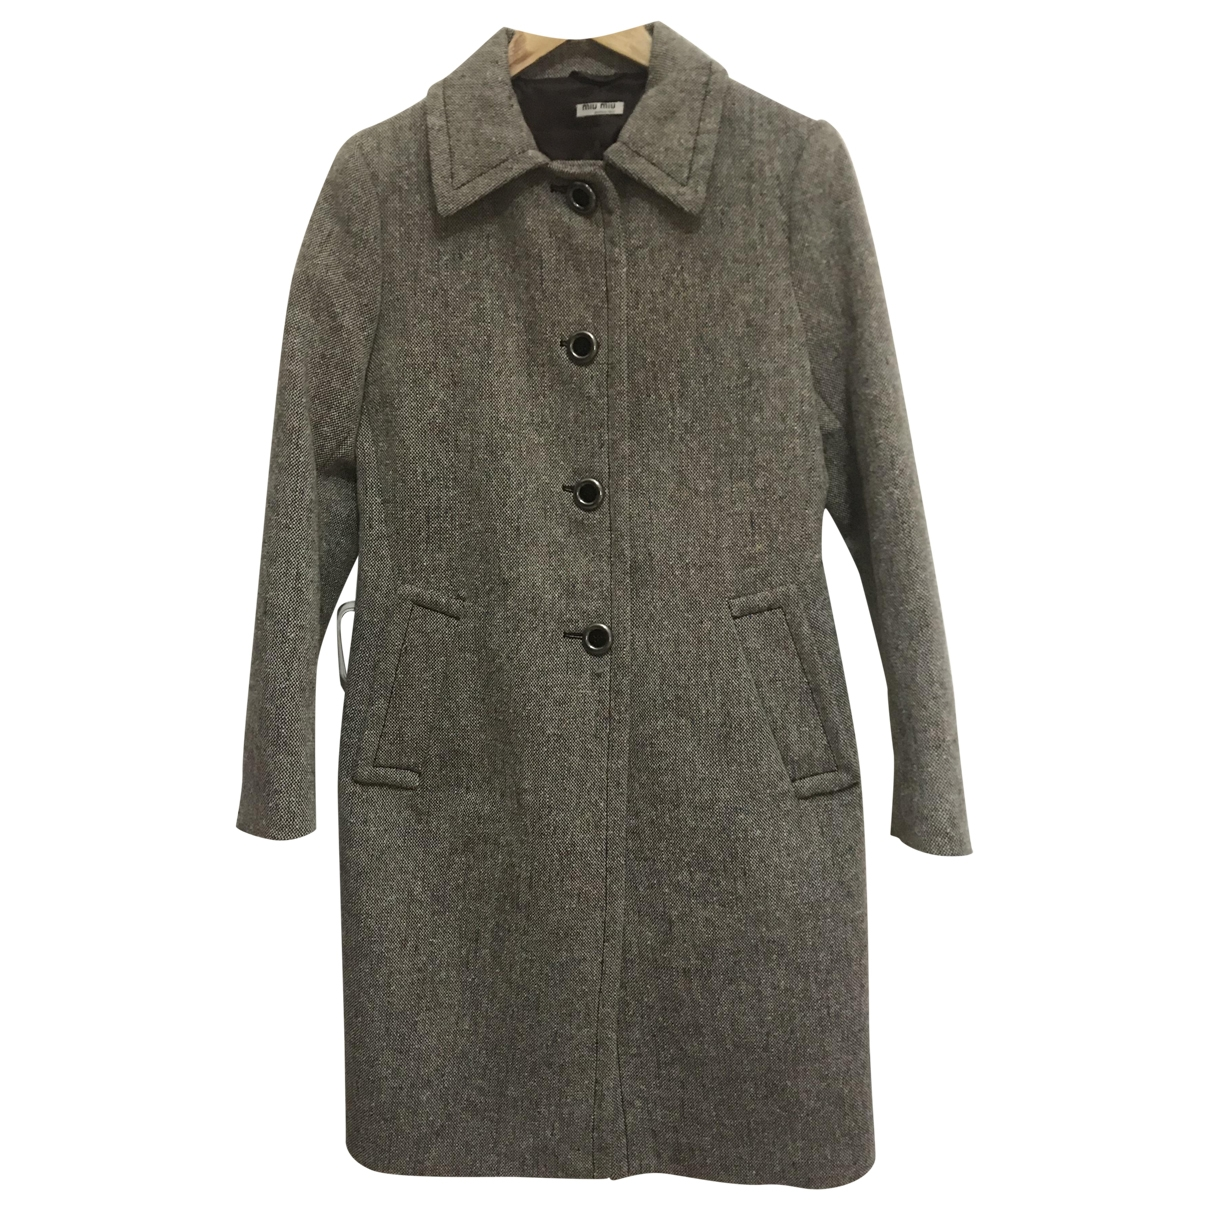 Miu Miu \N Multicolour Wool coat for Women 42 IT